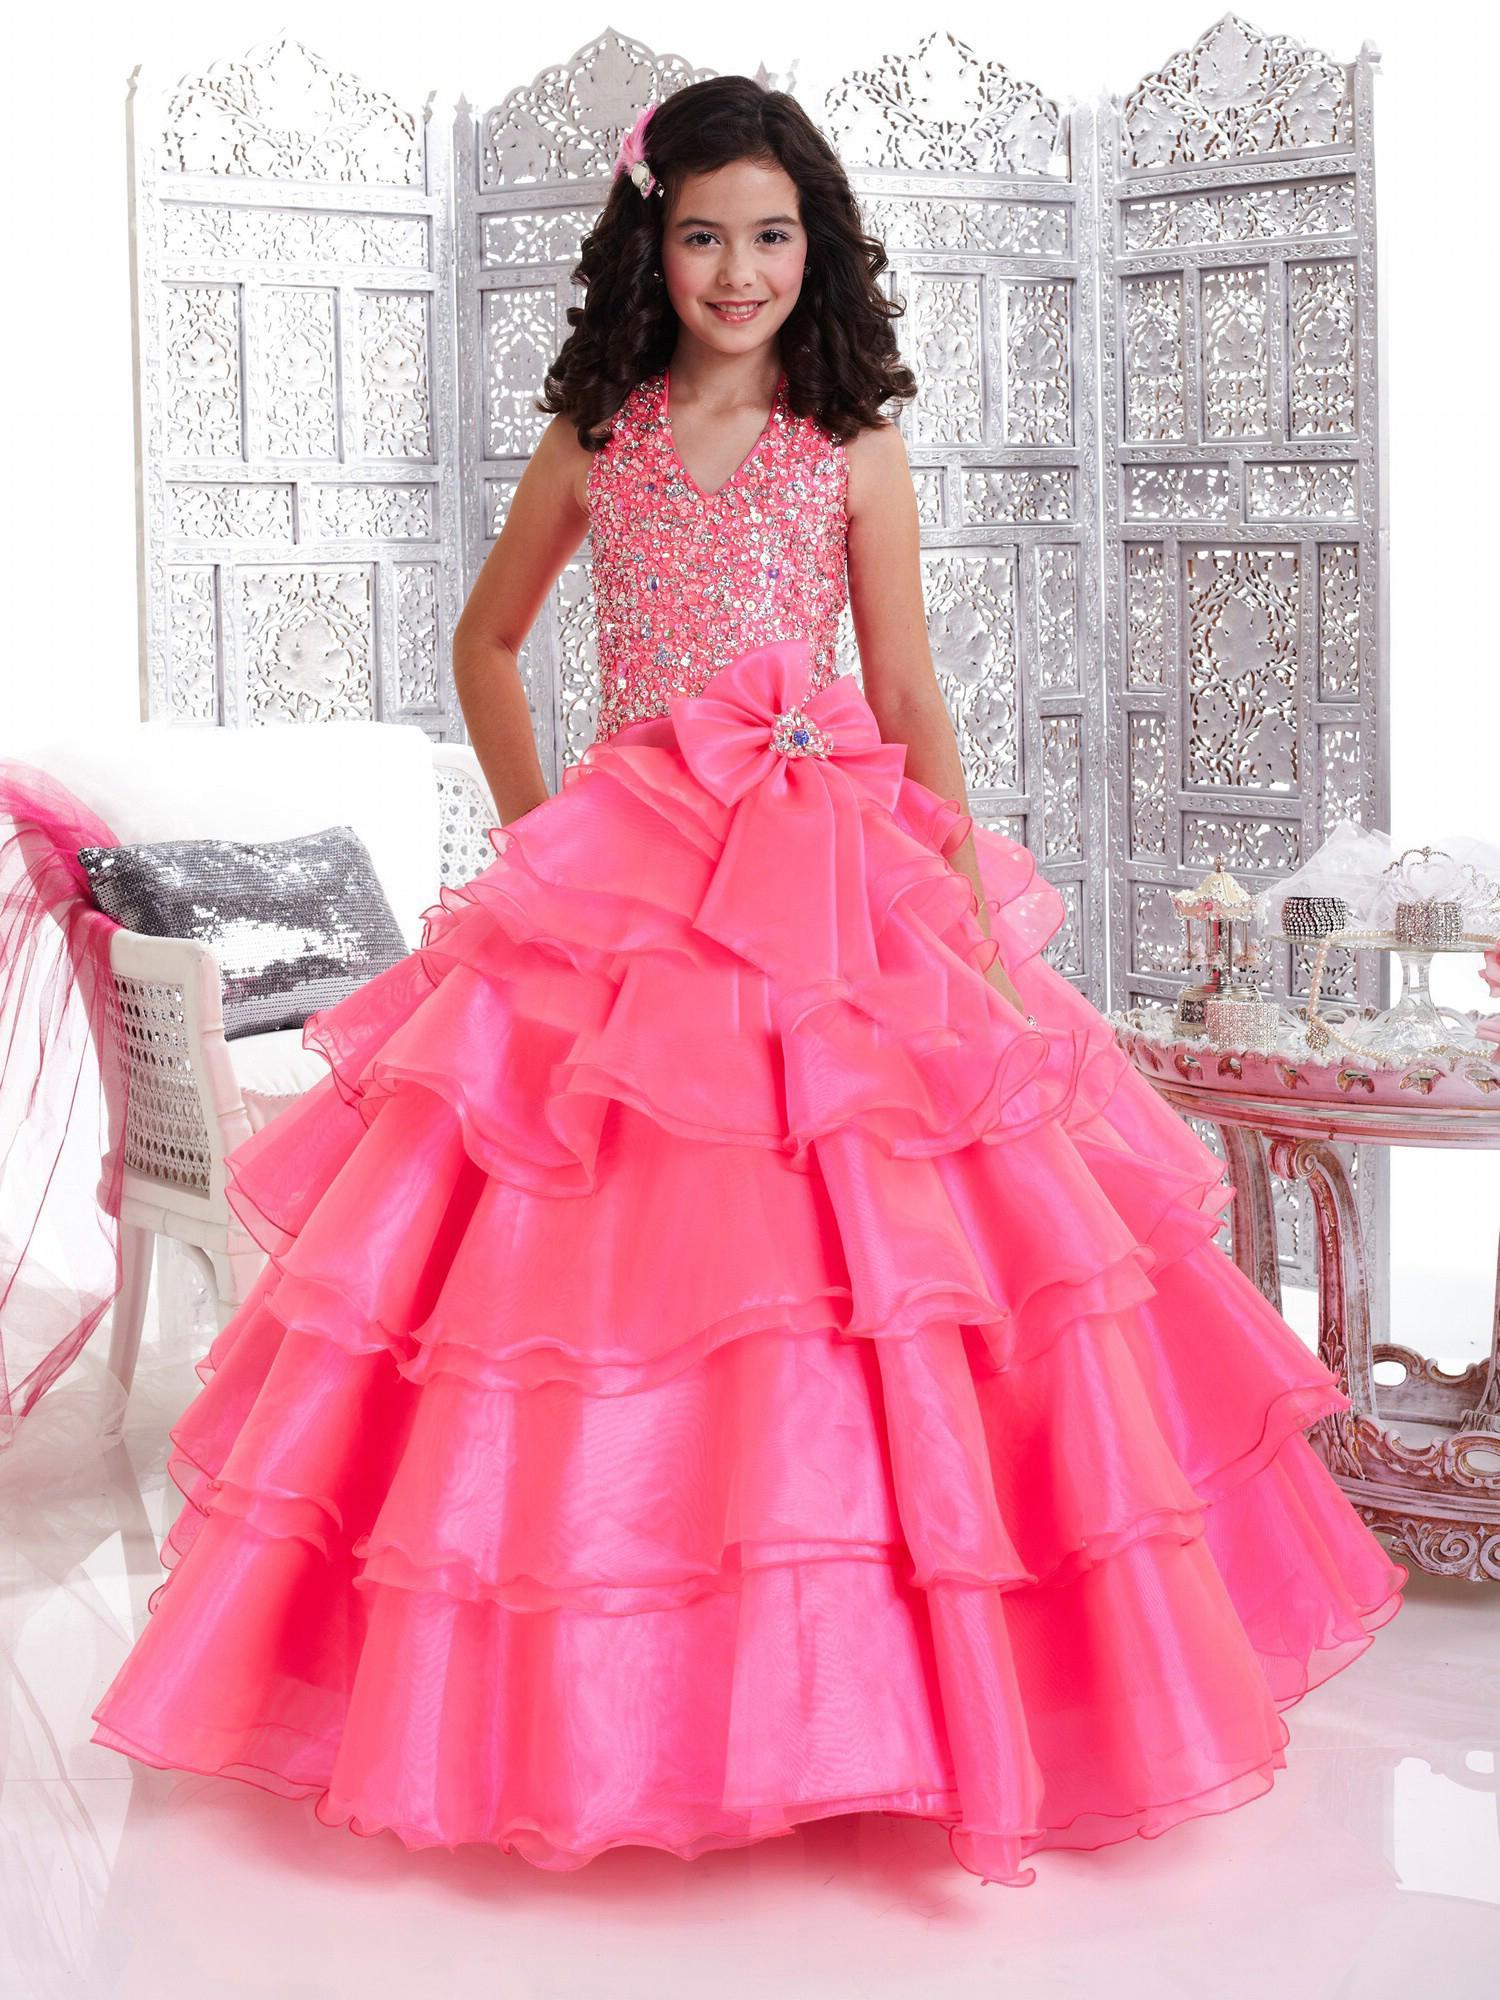 Blush Kids Pageant Dresses Halter Ball Gown Little Girls Birthday ...